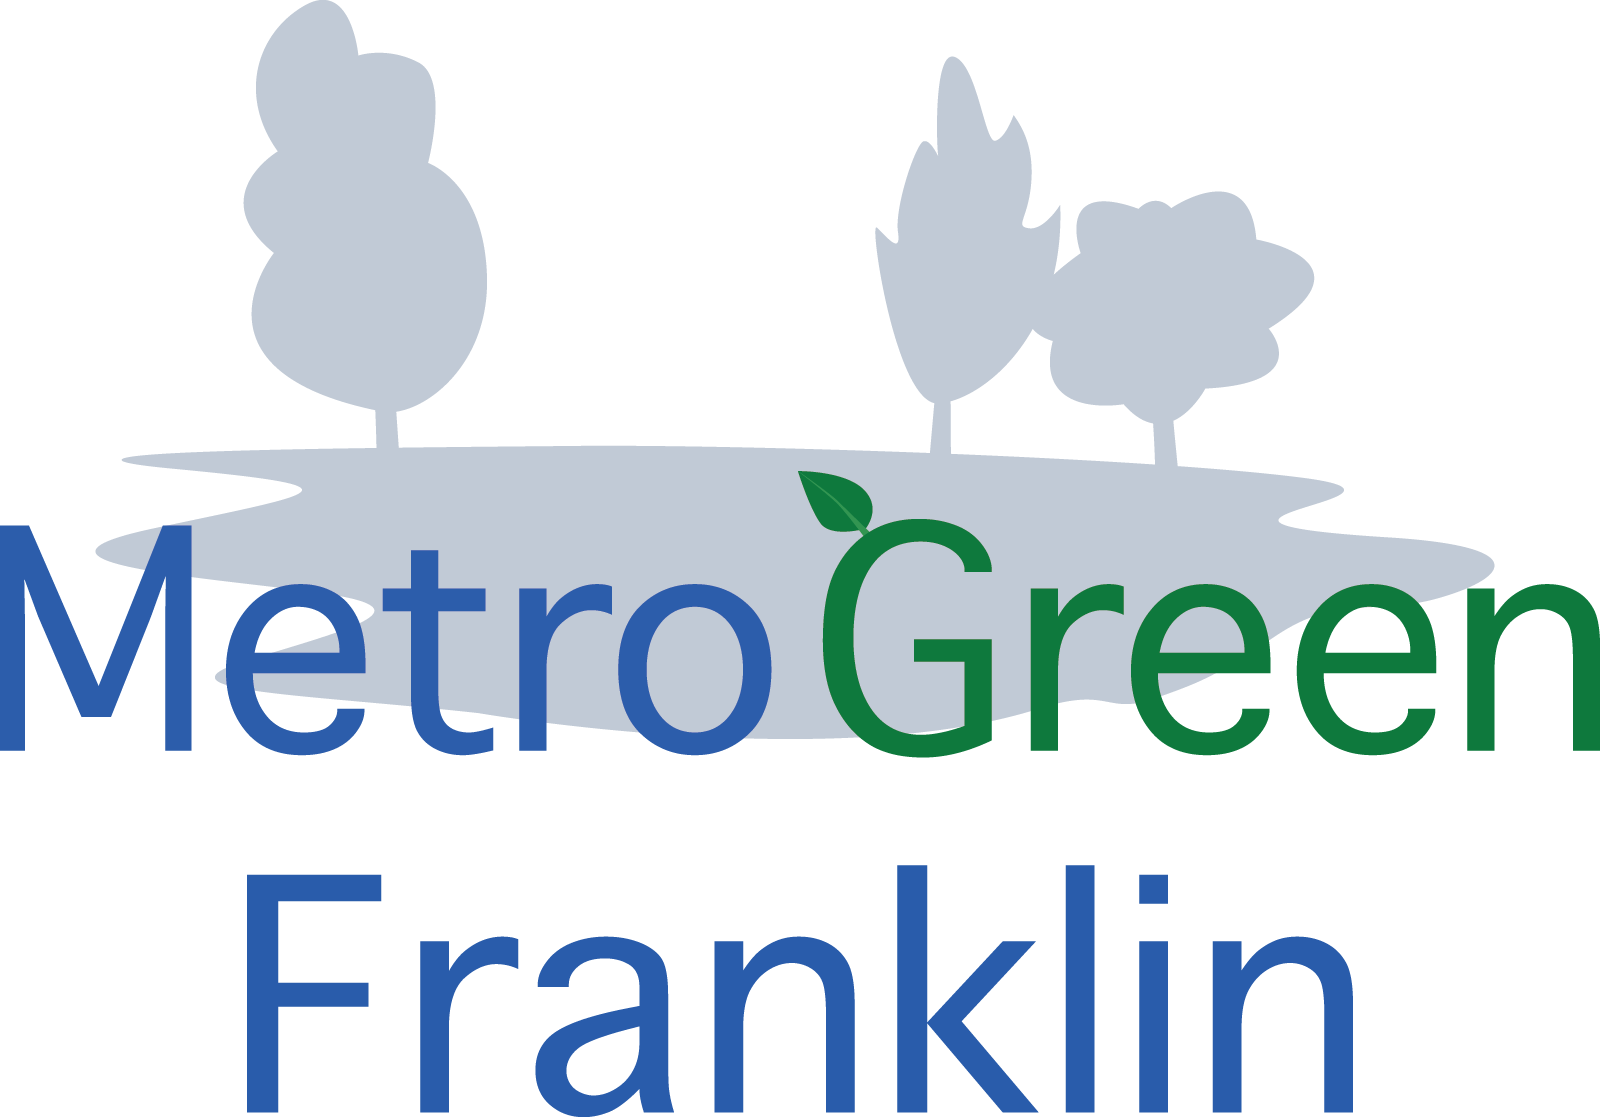 Metro Green Franklin